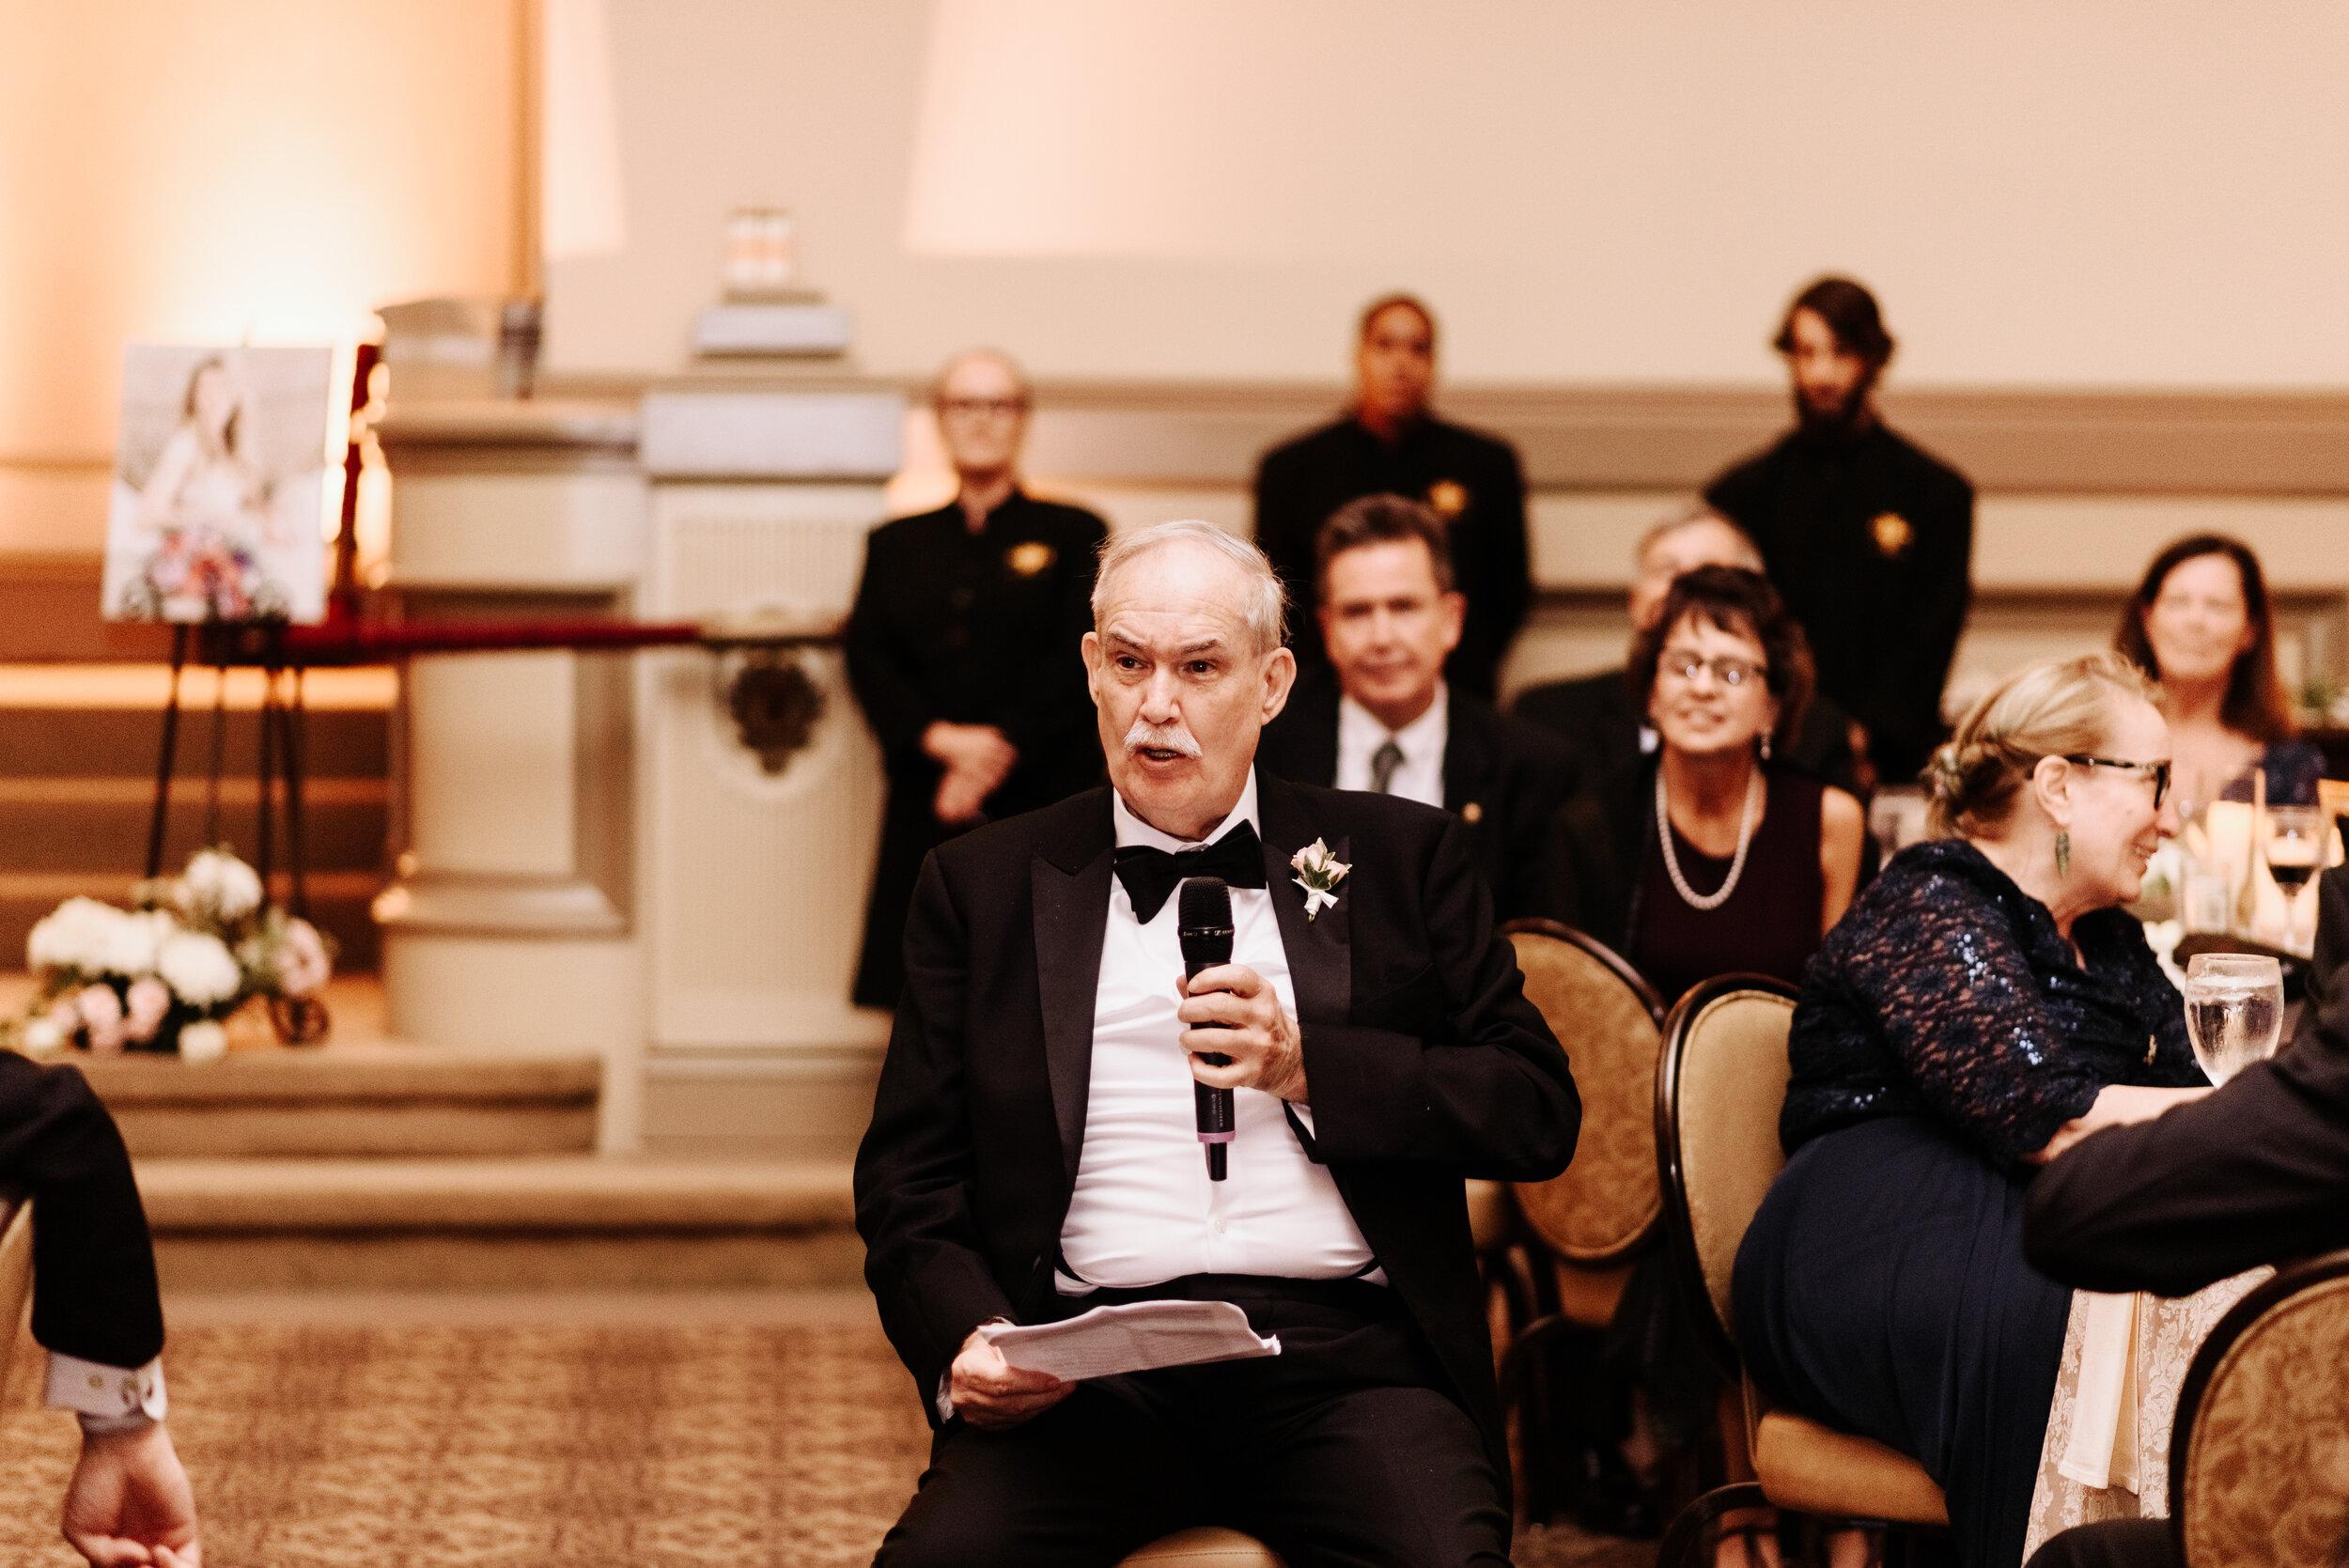 Cassie-Mrunal-Wedding-Quirk-Hotel-John-Marshall-Ballrooms-Richmond-Virginia-Photography-by-V-98.jpg